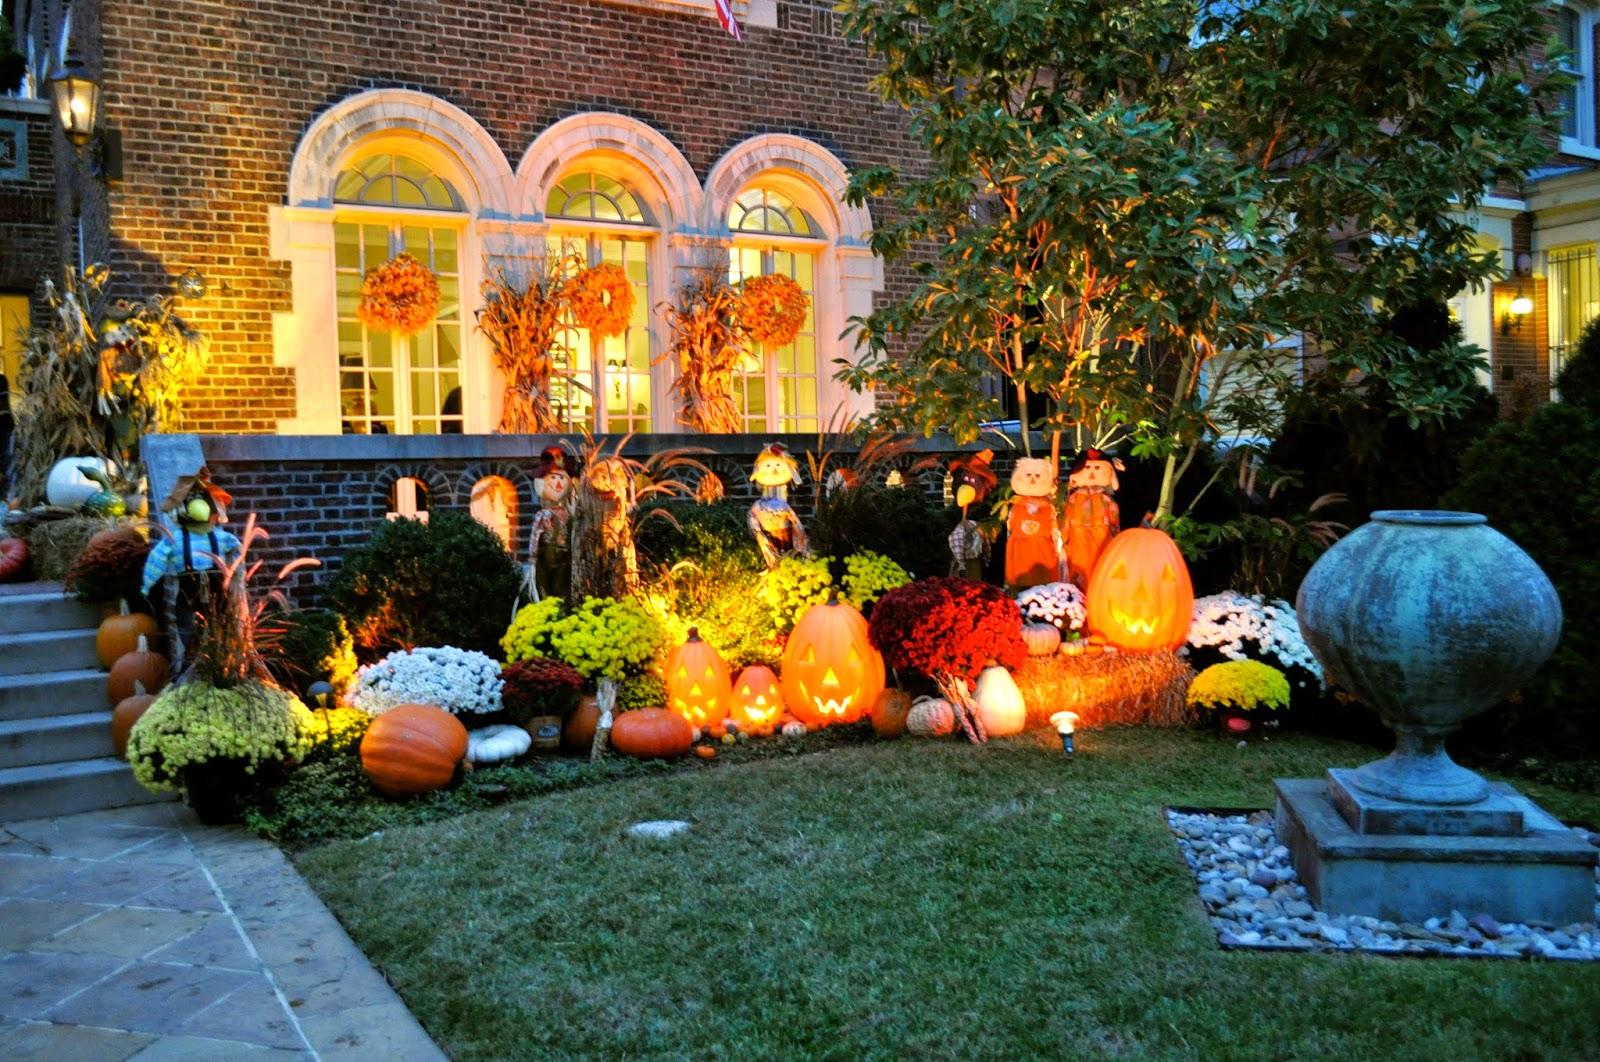 Halloween outdoor decorations pinterest - Triyaecom Fall Backyard Ideas Various Design Inspiration For